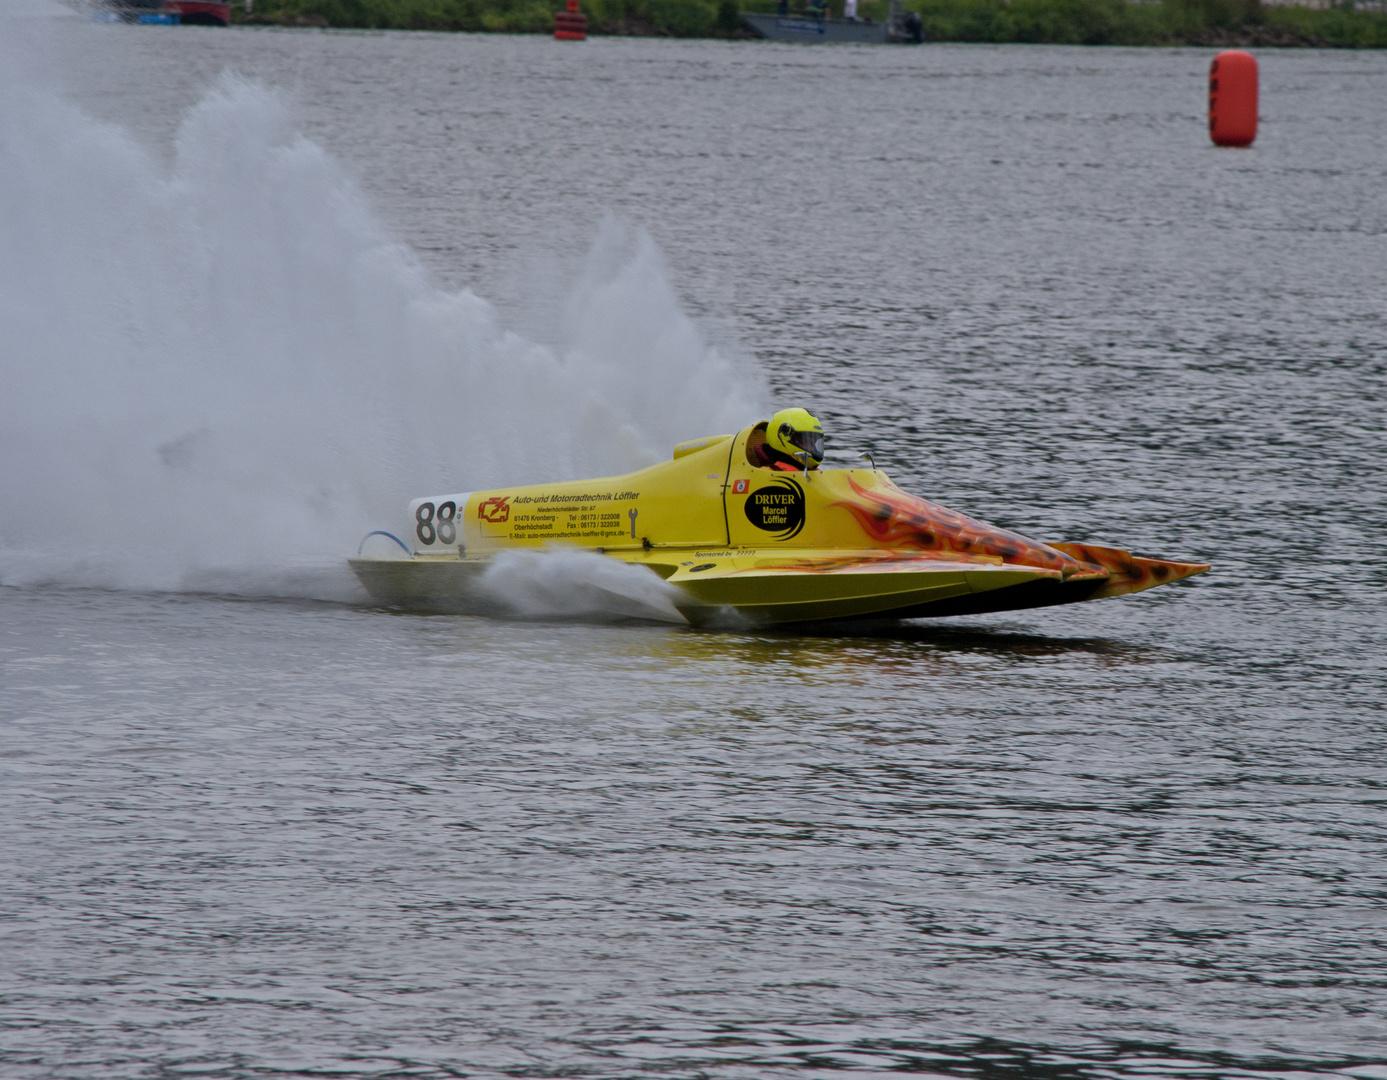 Speeboot